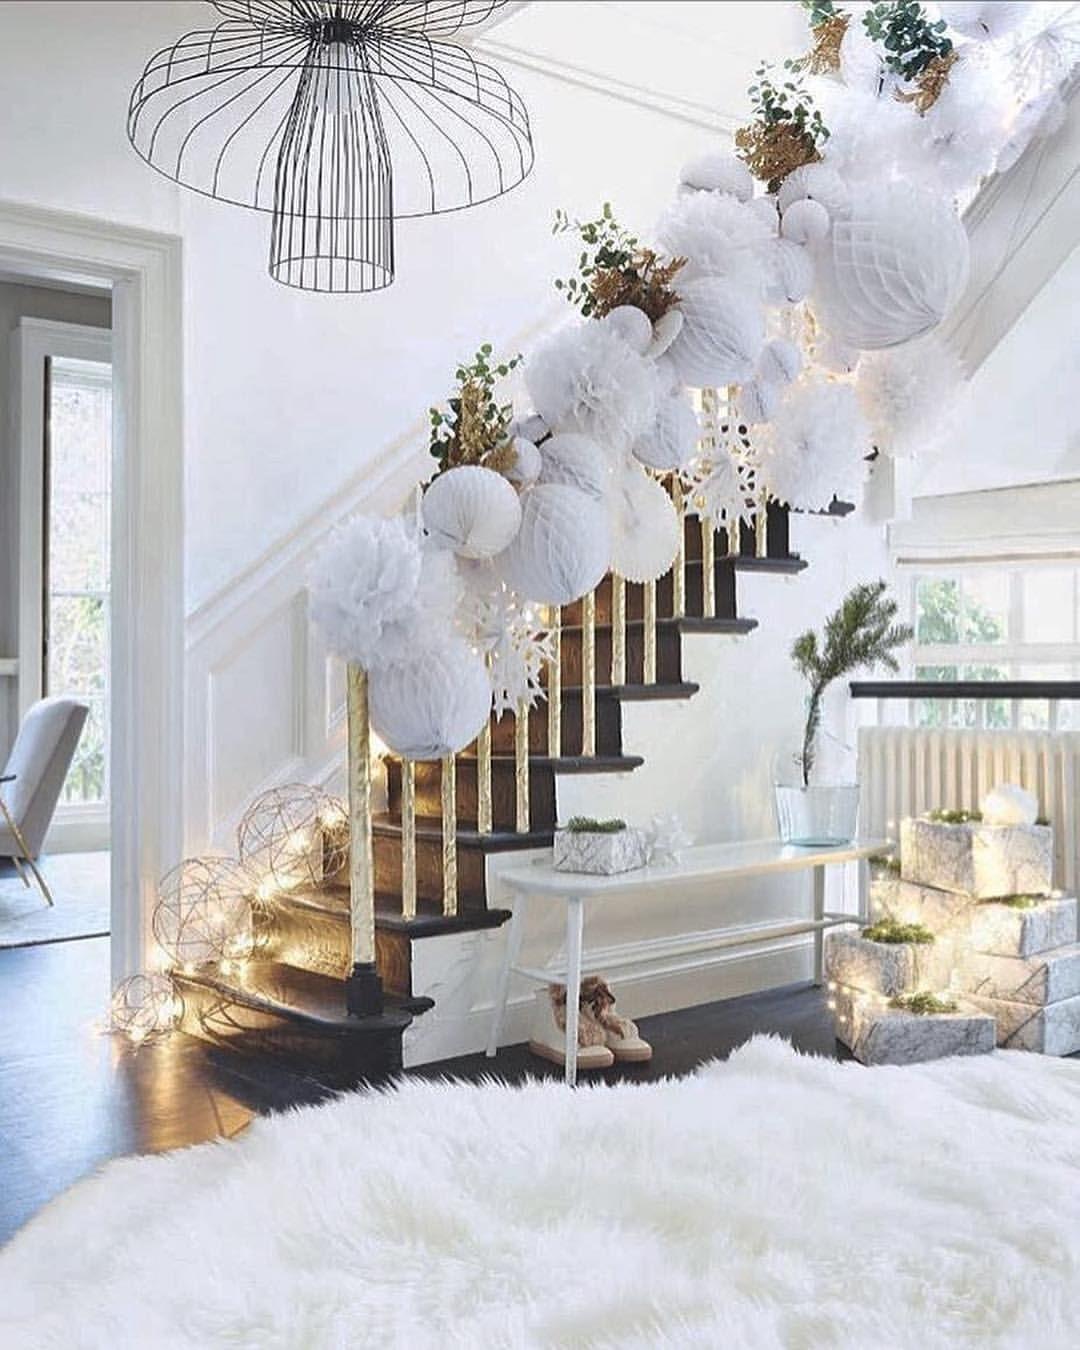 Winter cheer | Christmas staircase, Christmas interiors, White christmas decor